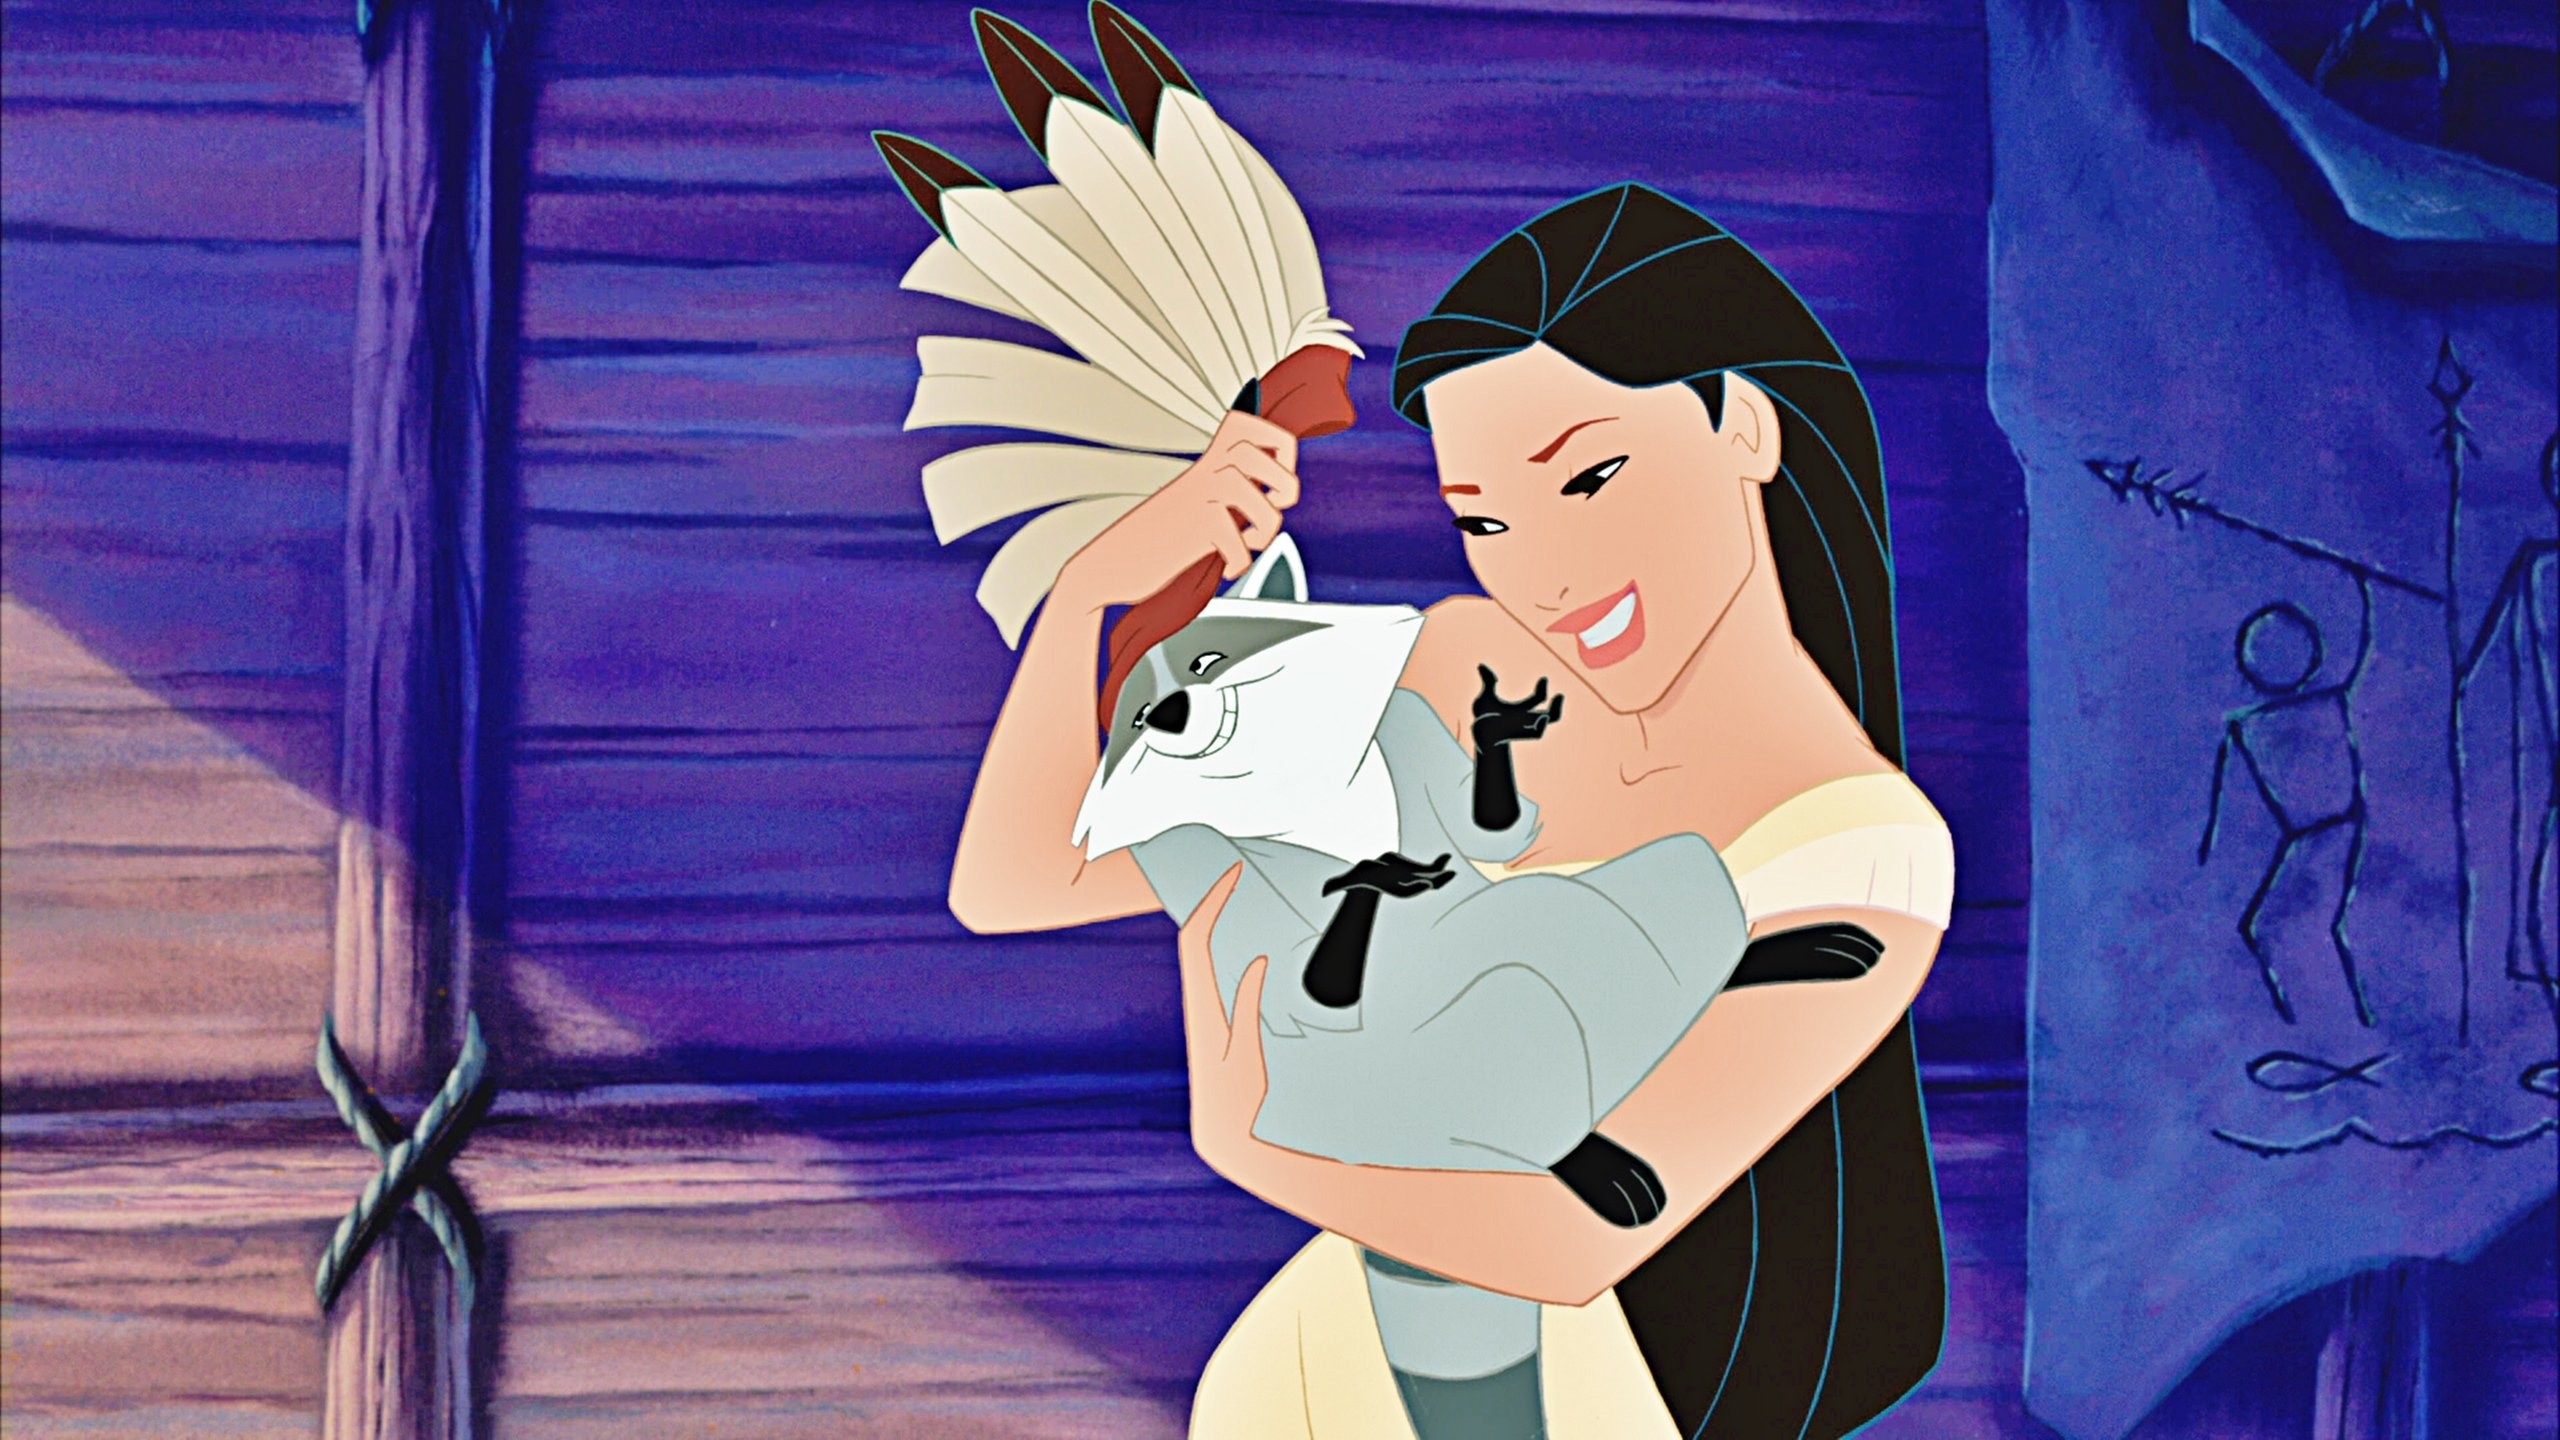 Res: 2560x1440, Pocahontas Disney - WallDevil